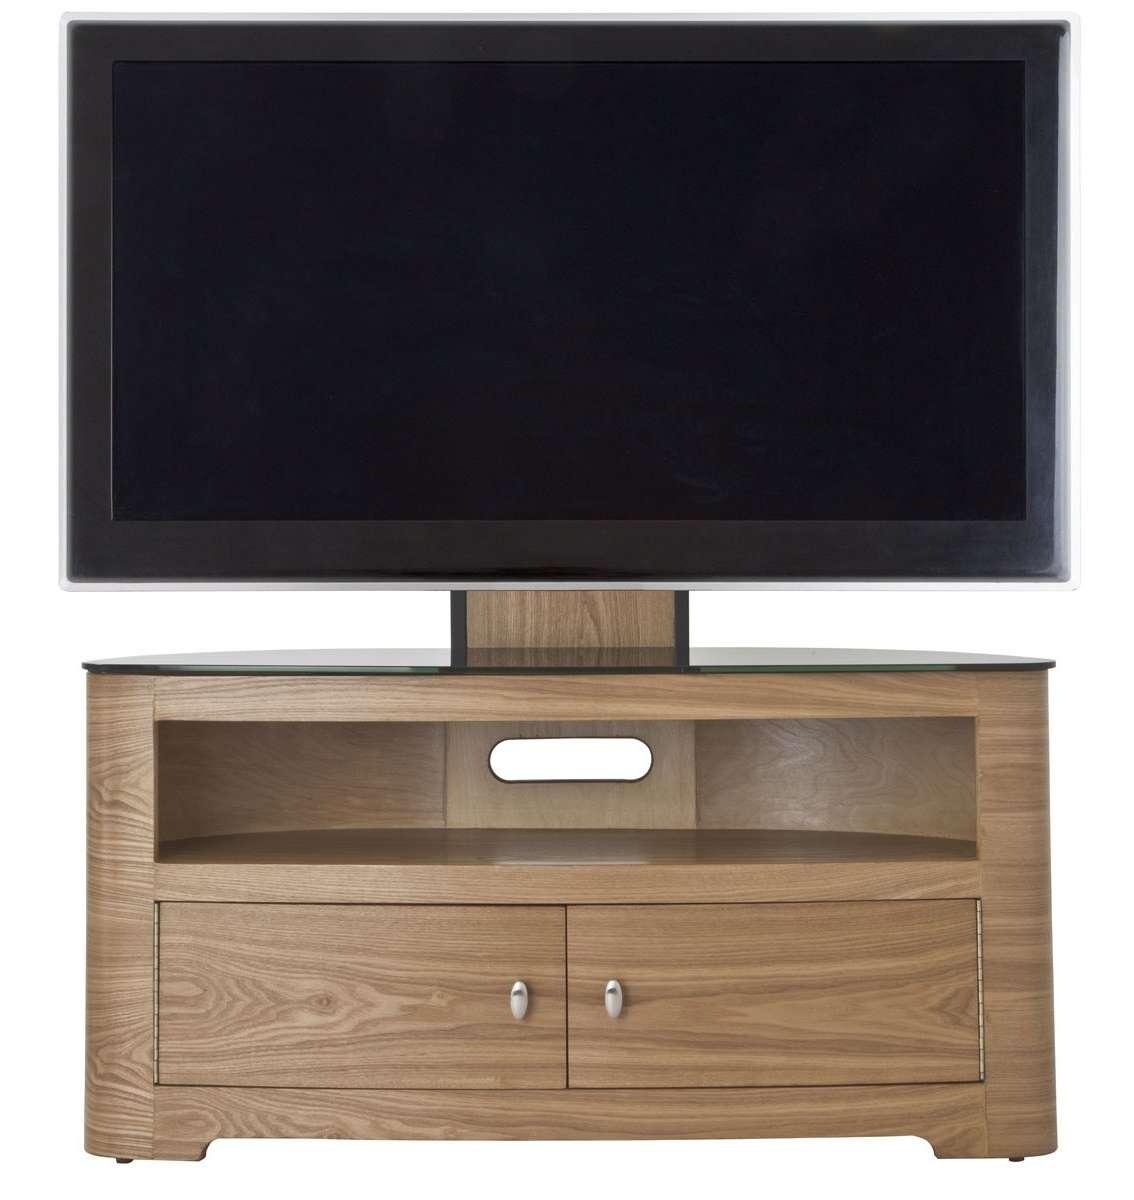 Avf Blenheim Oak Cantilever Tv Stand Regarding Oak Tv Stands Furniture (View 14 of 15)